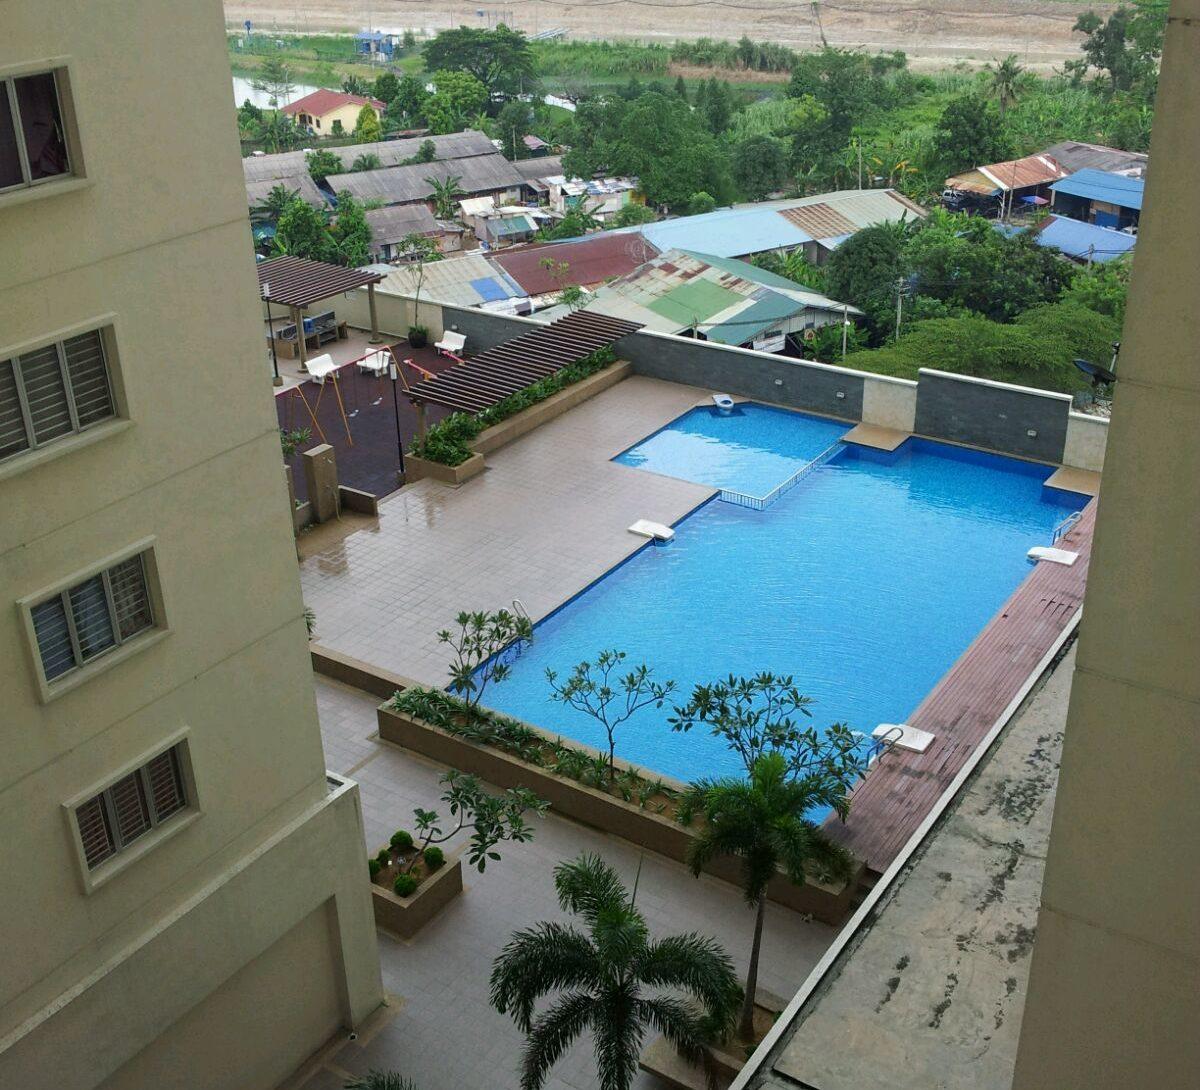 Alam Idaman Apartment Batu 3 Shah Alam